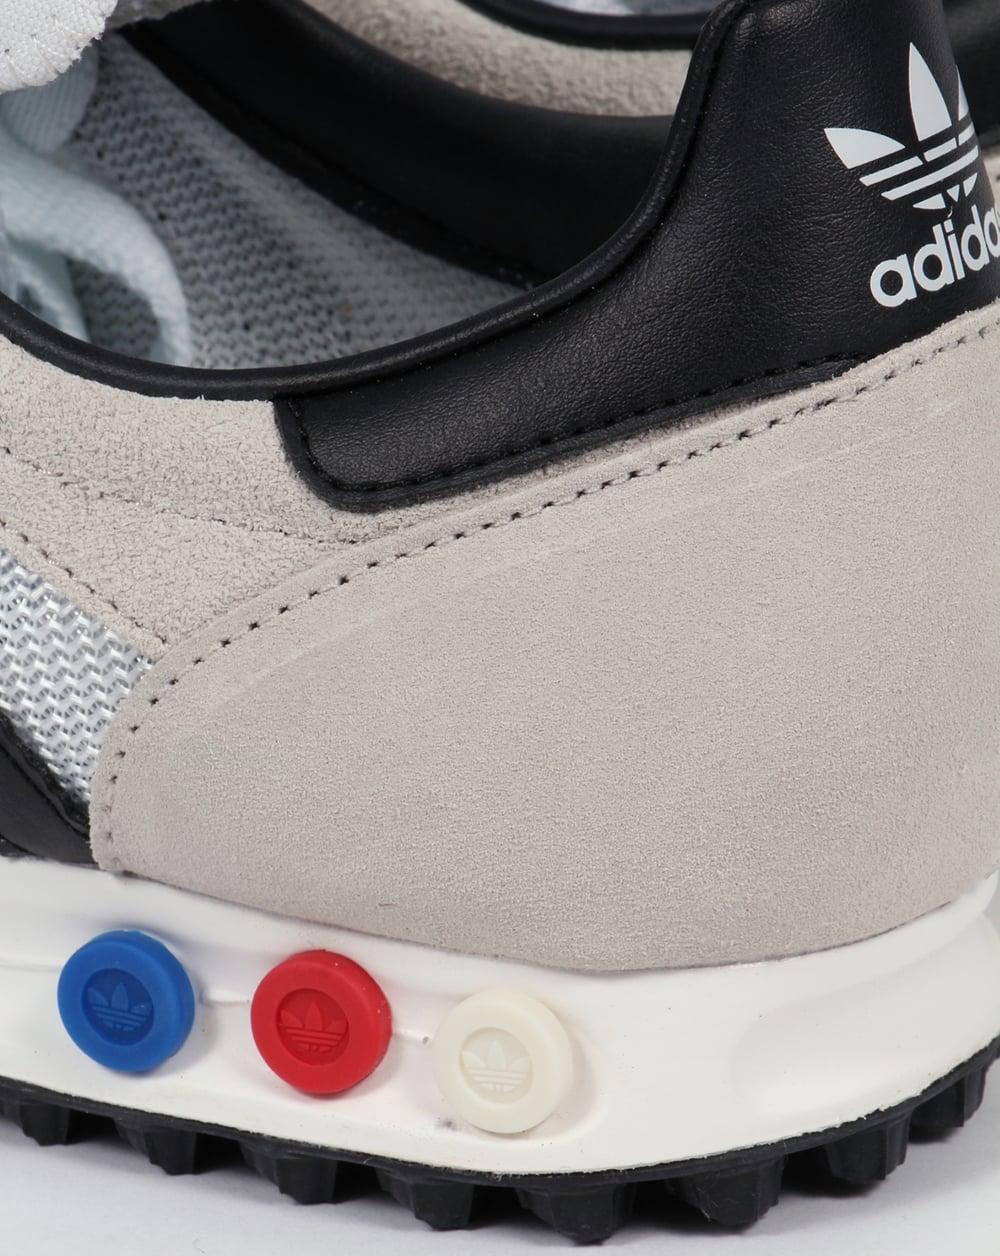 Trener Adidas Originaler Menns Casual Sko zCChQskqG